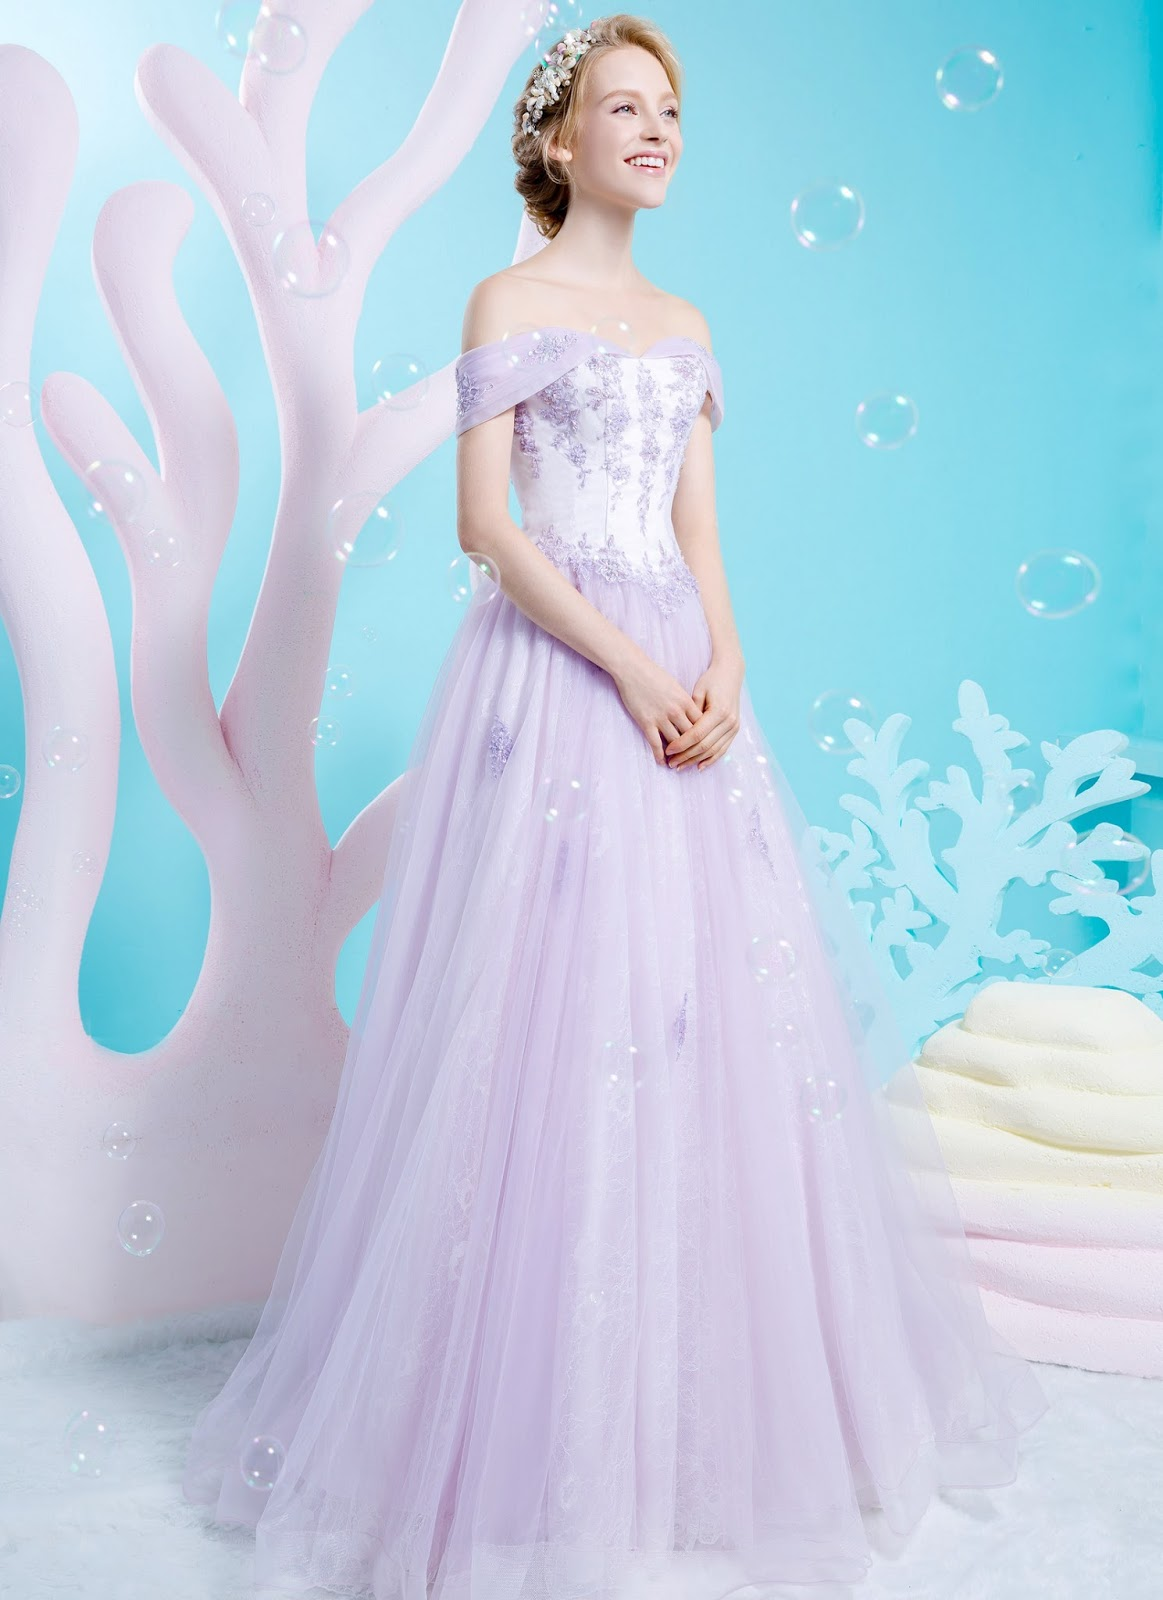 13 Best Snow White Wedding Dresses Wedding Celebration